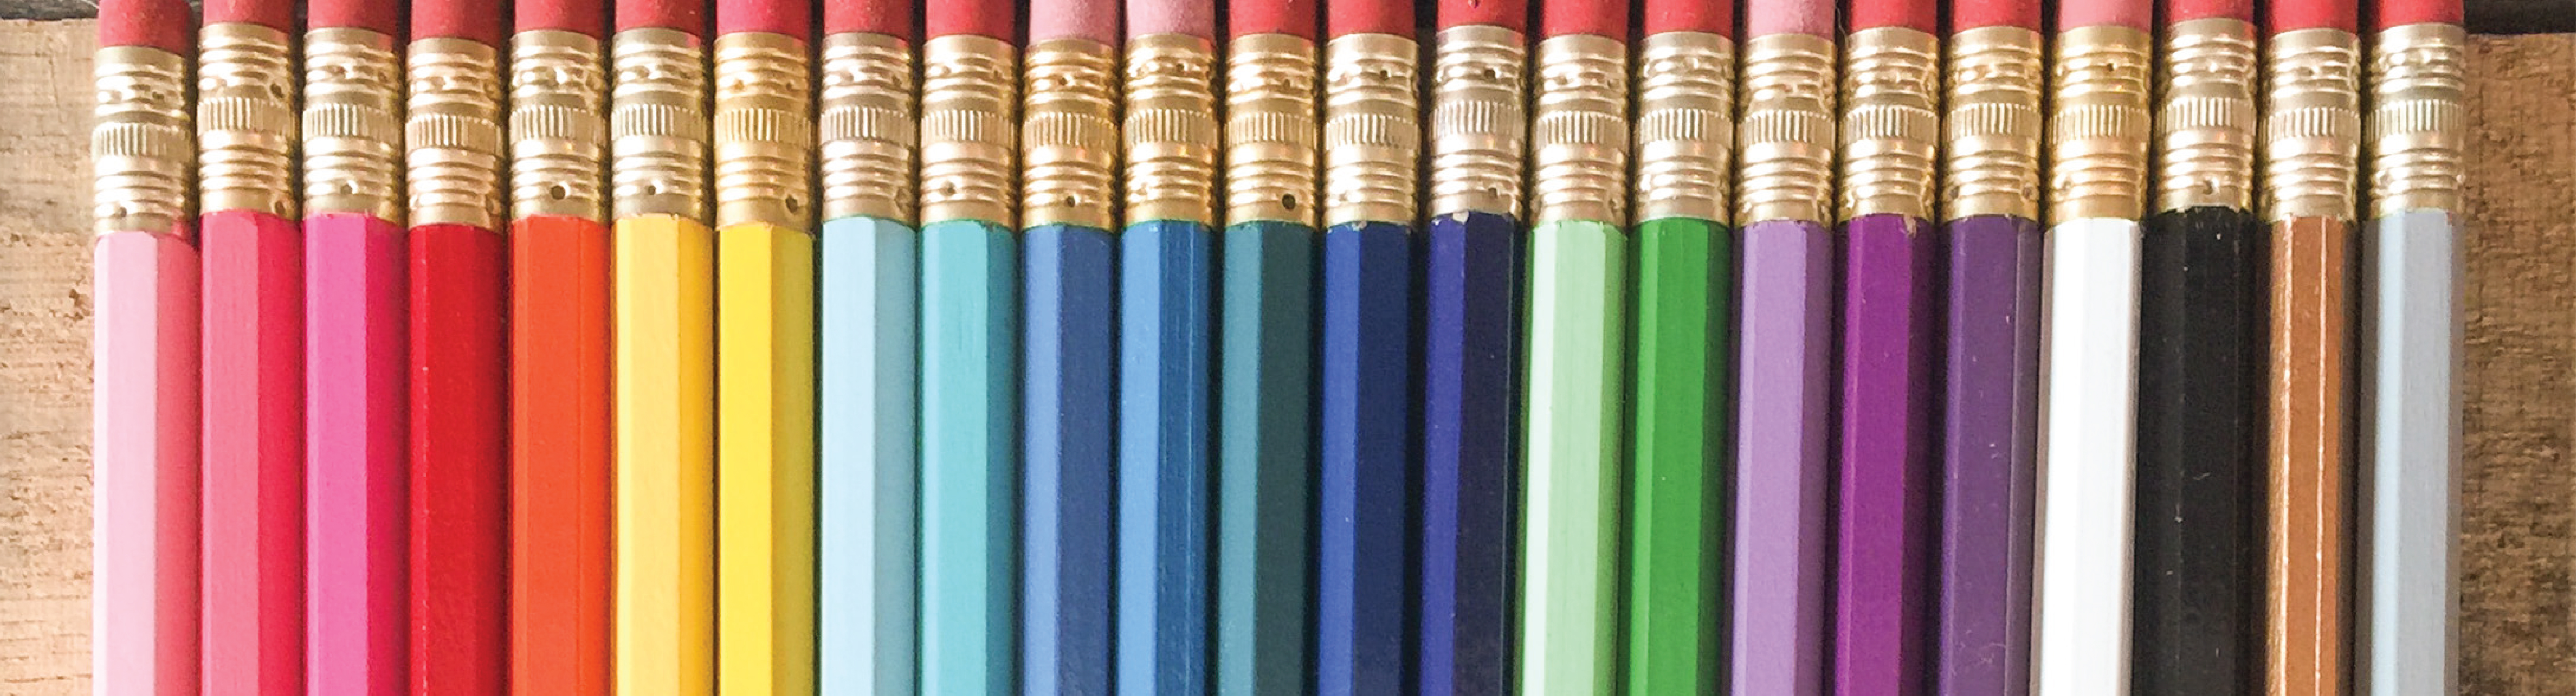 pencils-01.jpg